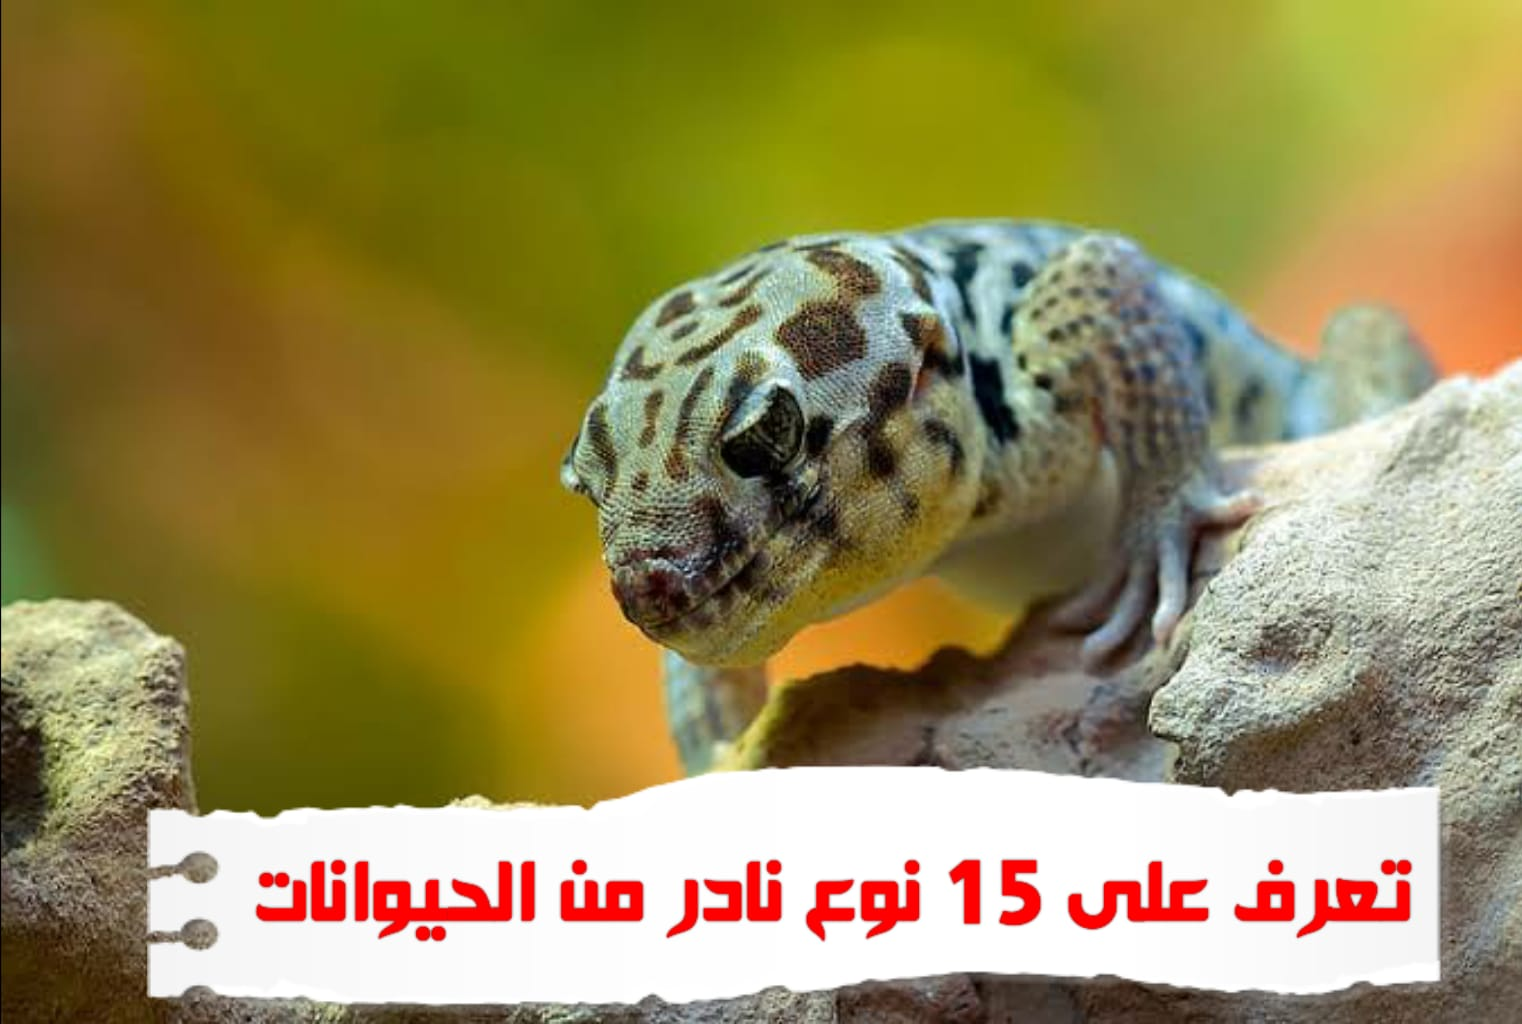 WhatsApp Image 2020 06 21 at 6.26.55 PM - حيوانات نادرة هذه هي أندر الحيوانات في العالم